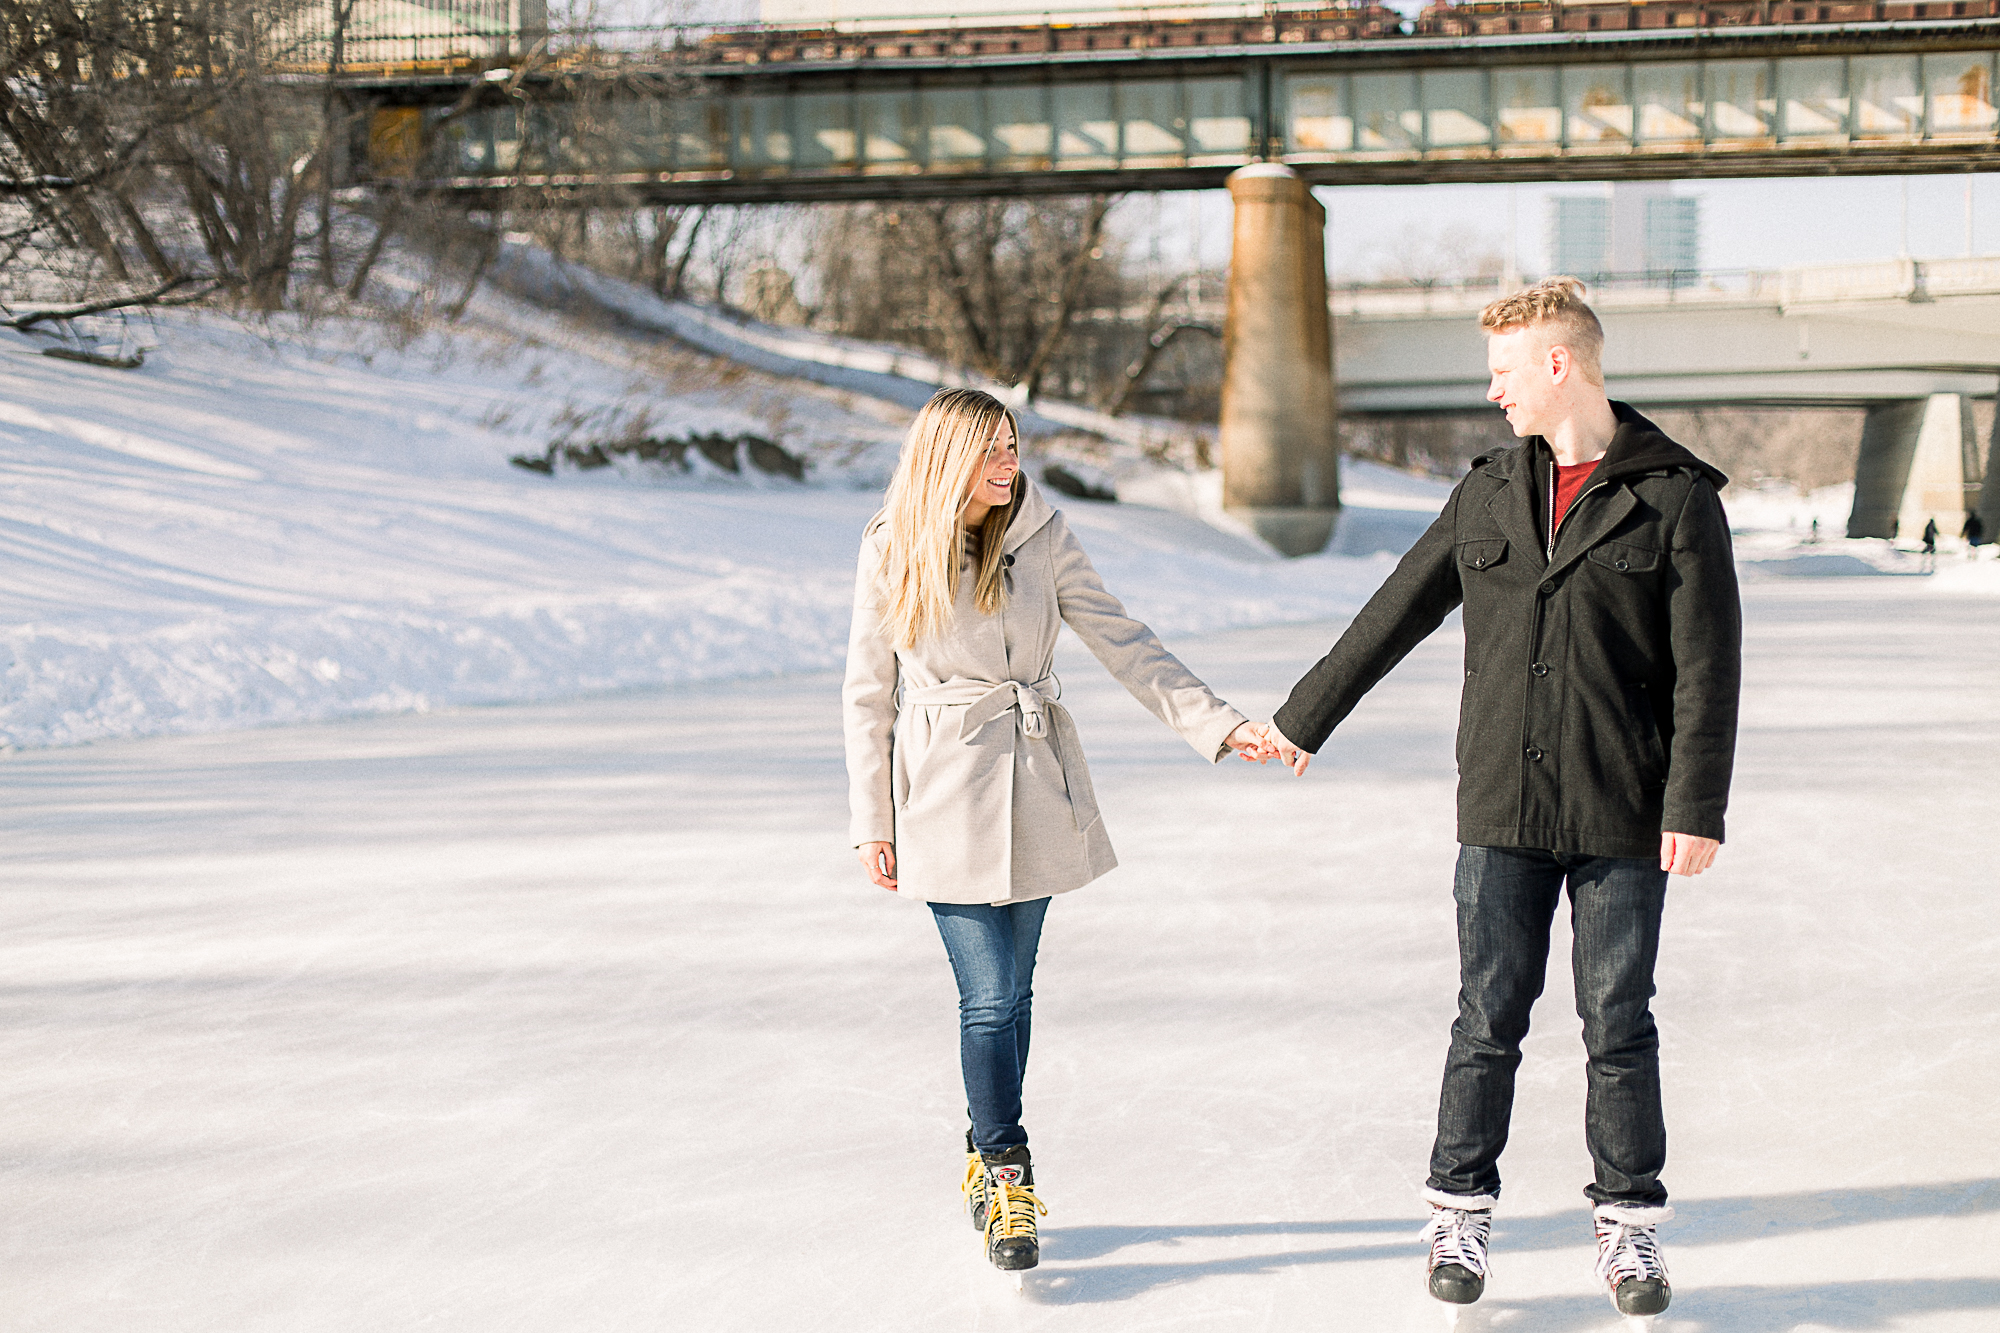 The-Forks-River-Trail-Skating-Engagement-Photoshoot-Keila-Marie-Photography-Winnipeg-Manitoba